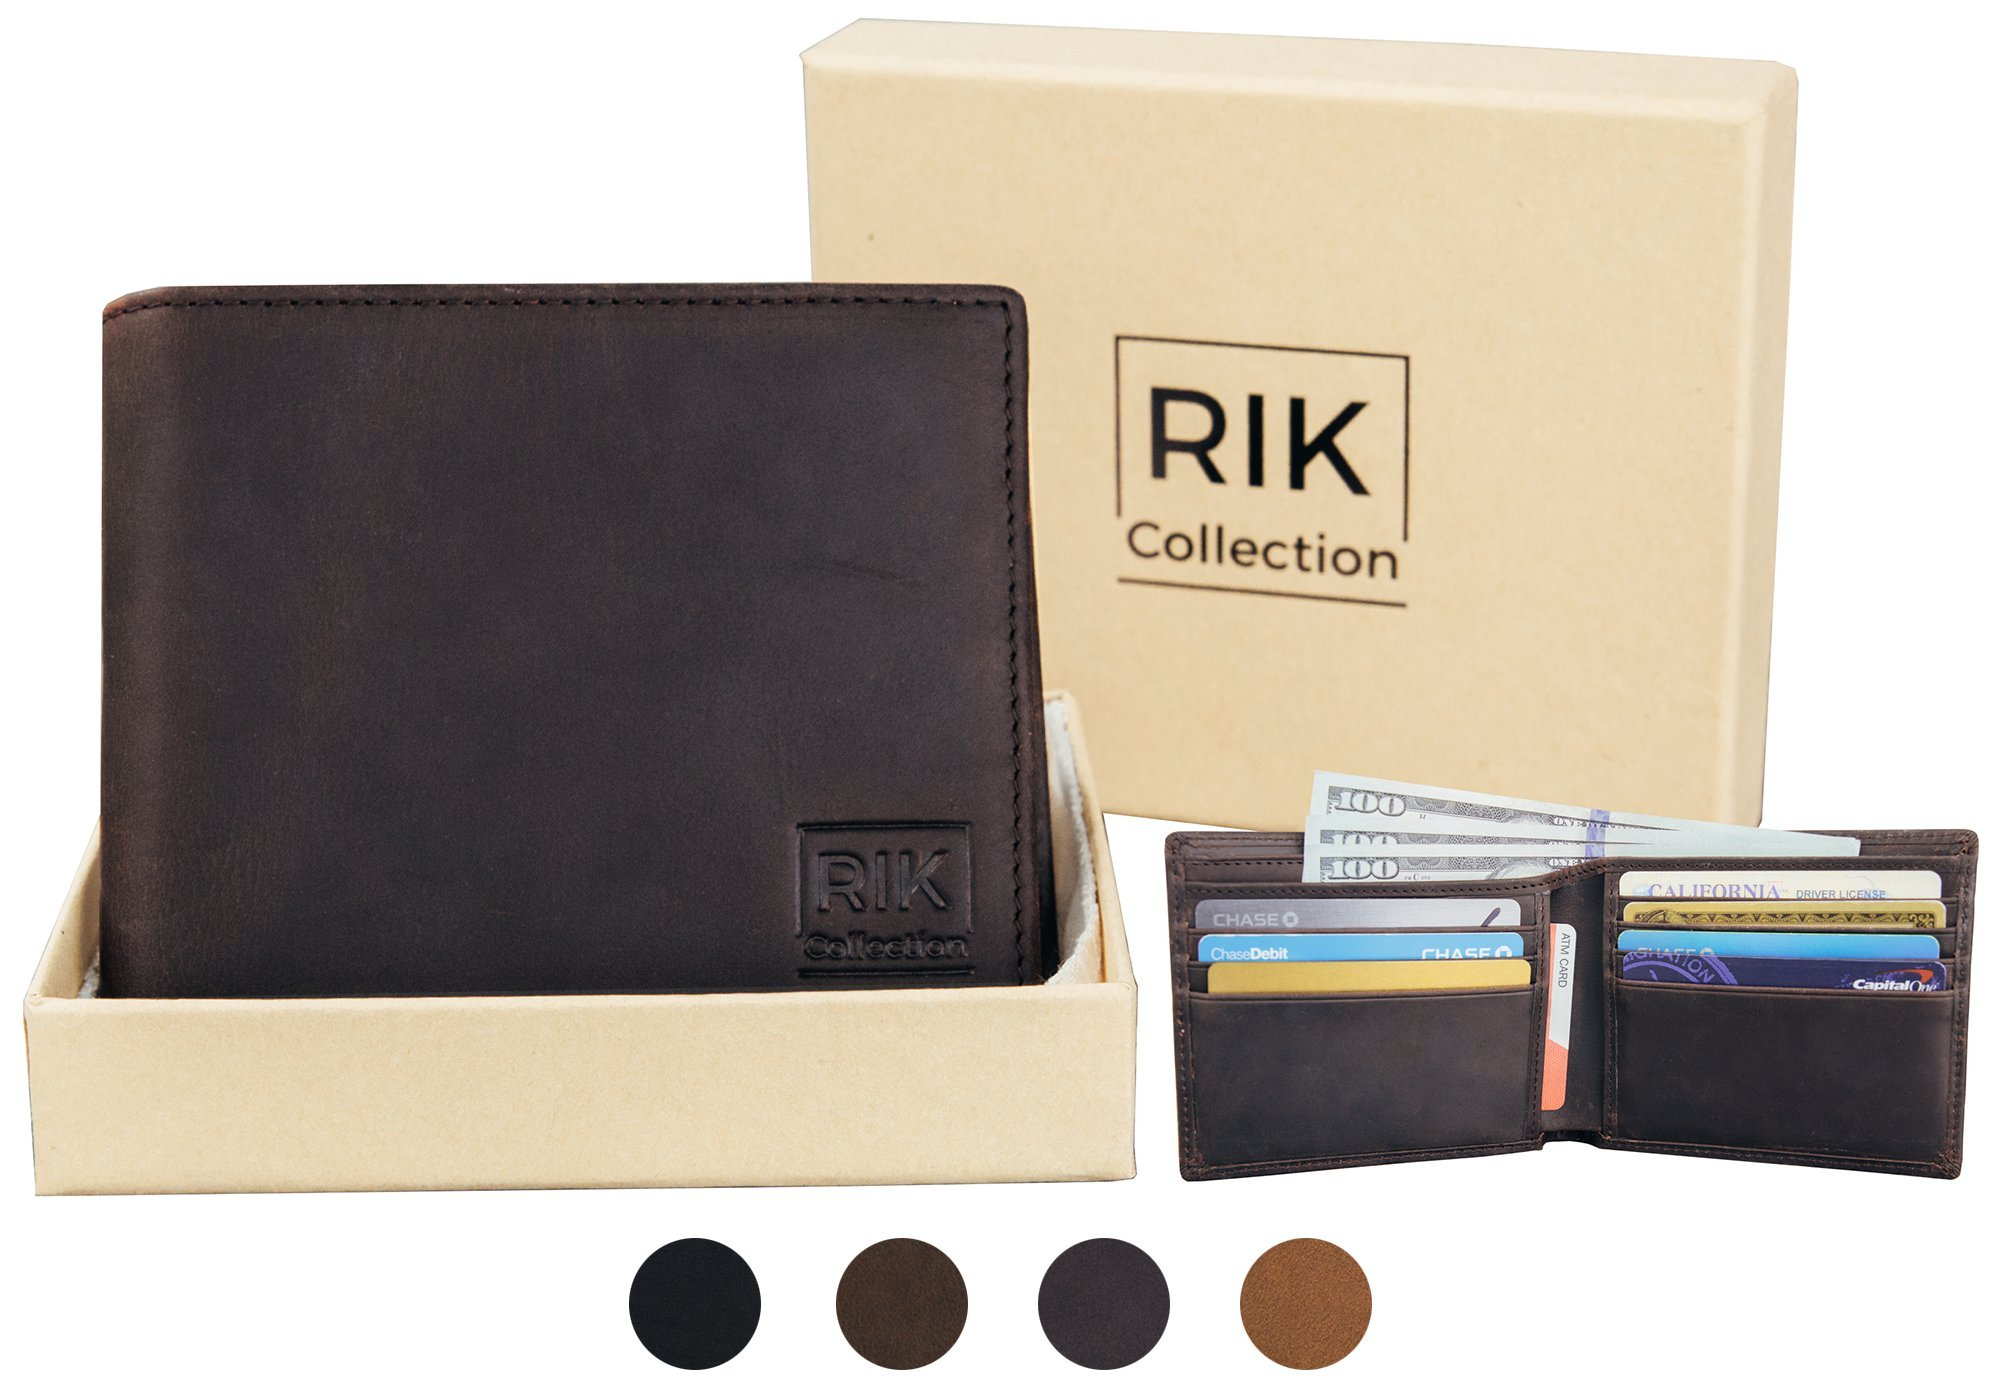 RIK COLLECTION Slim RFID Blocking Italian Genuine Leather Bifold Wallets For Men (Dark Brown)